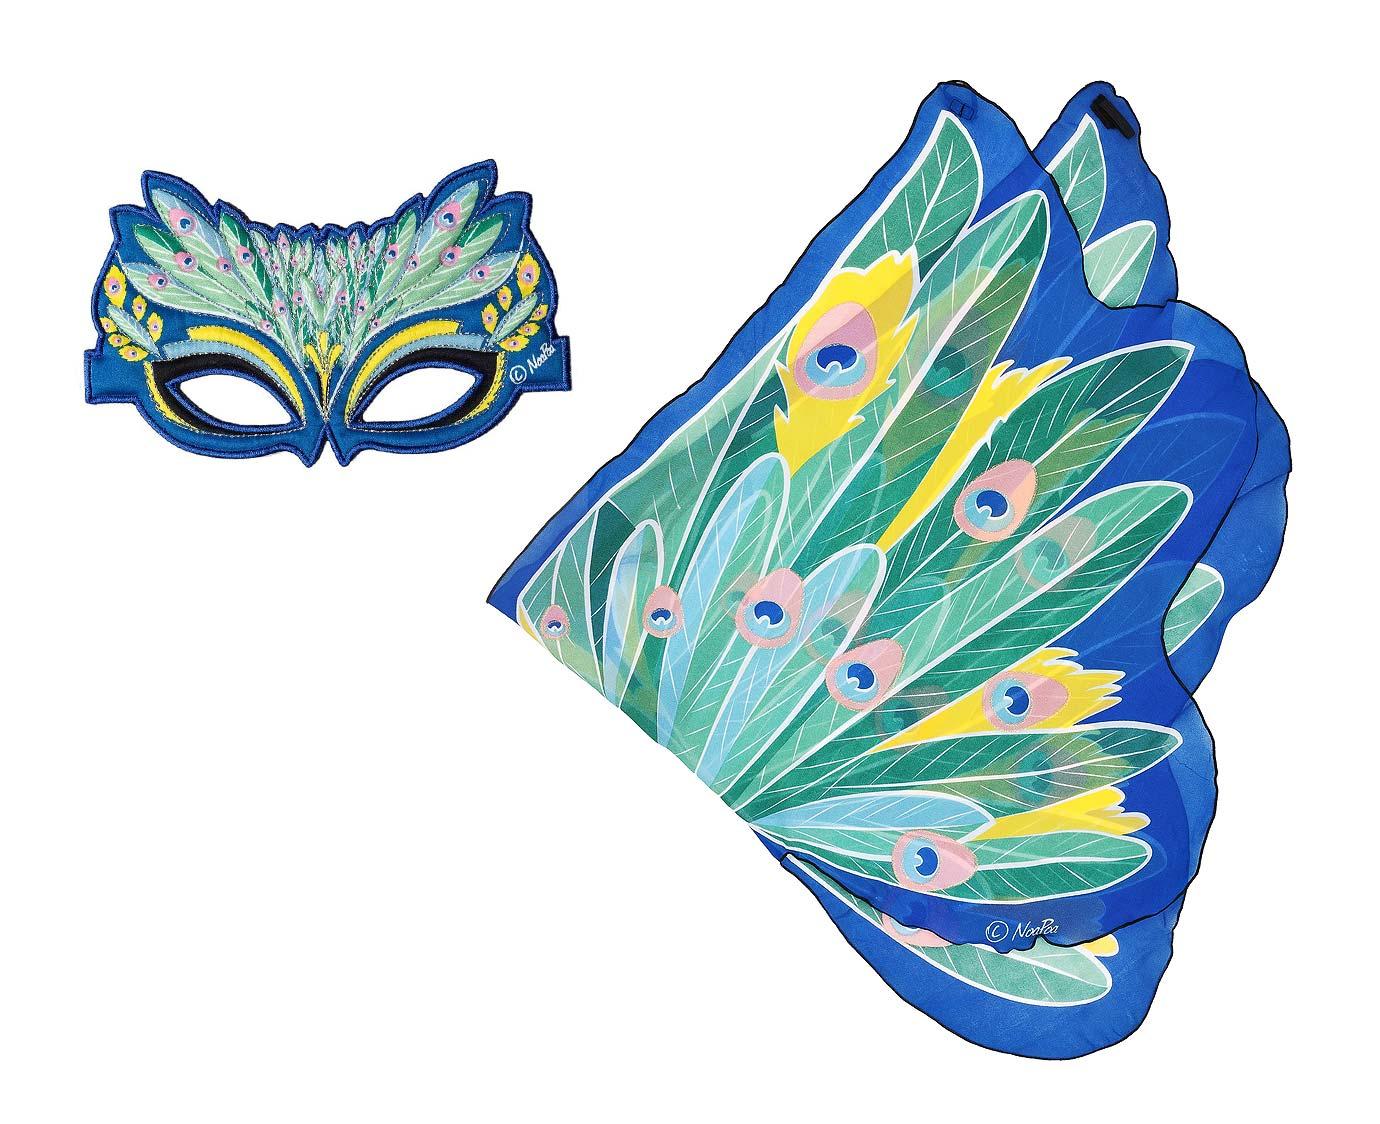 Vleugel set 'Peacock' kleur